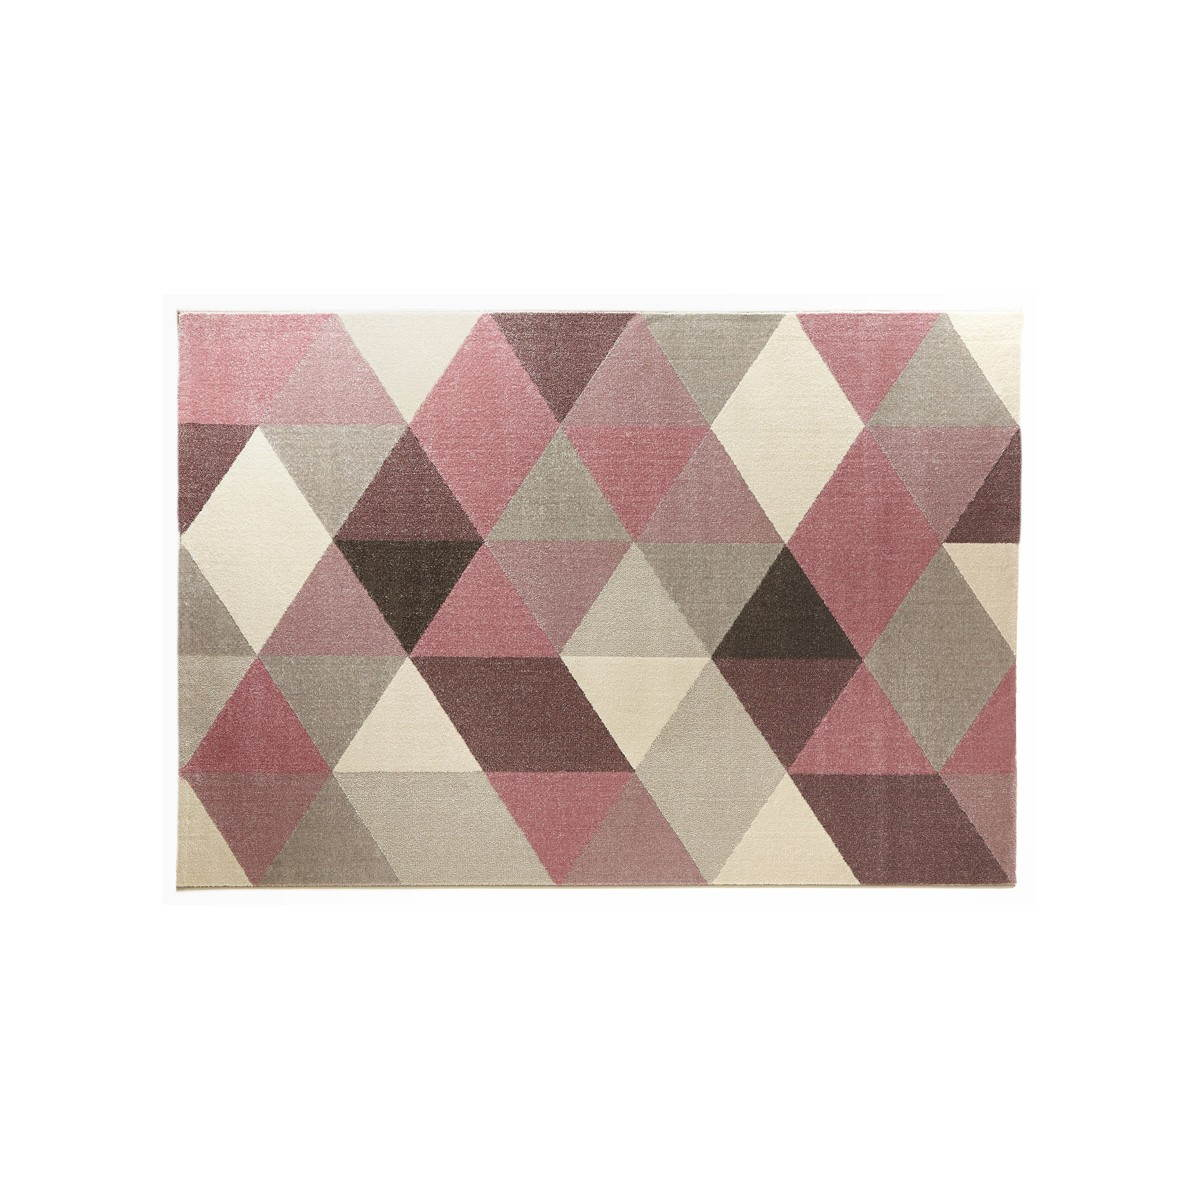 tapis design style scandinave rectangulaire geo 230cm x 160cm rose gris beige amp story 3764